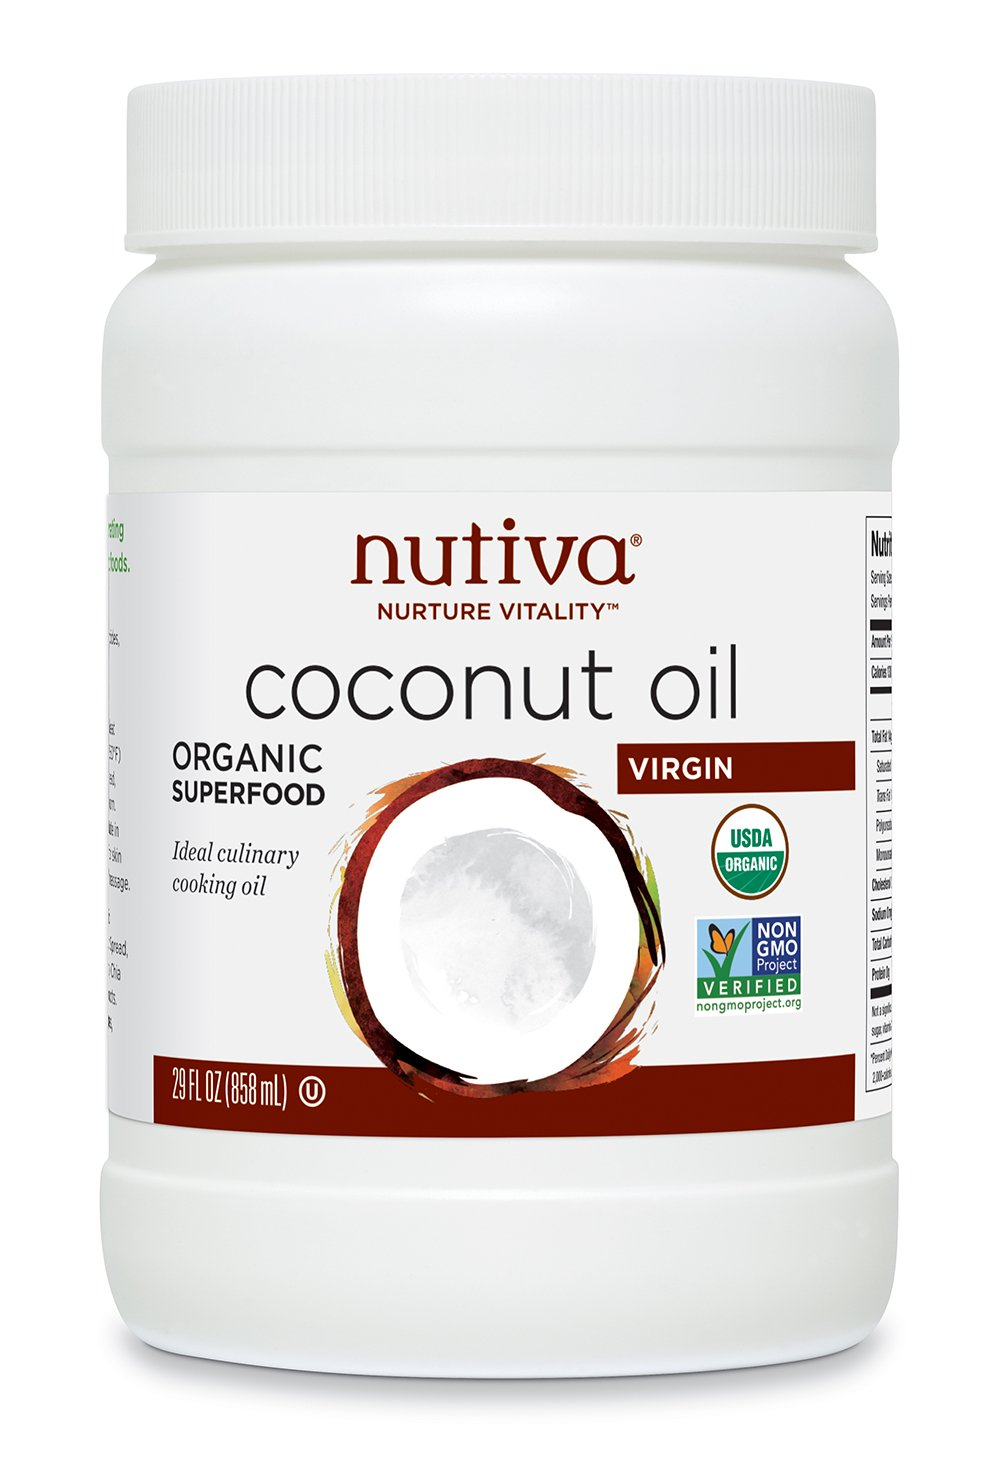 Nutiva Organic, Cold-Pressed, Unrefined, Virgin Coconut Oil from Fresh, non-GMO, Sustainably Farmed Coconuts, 29 Fluid Ounces